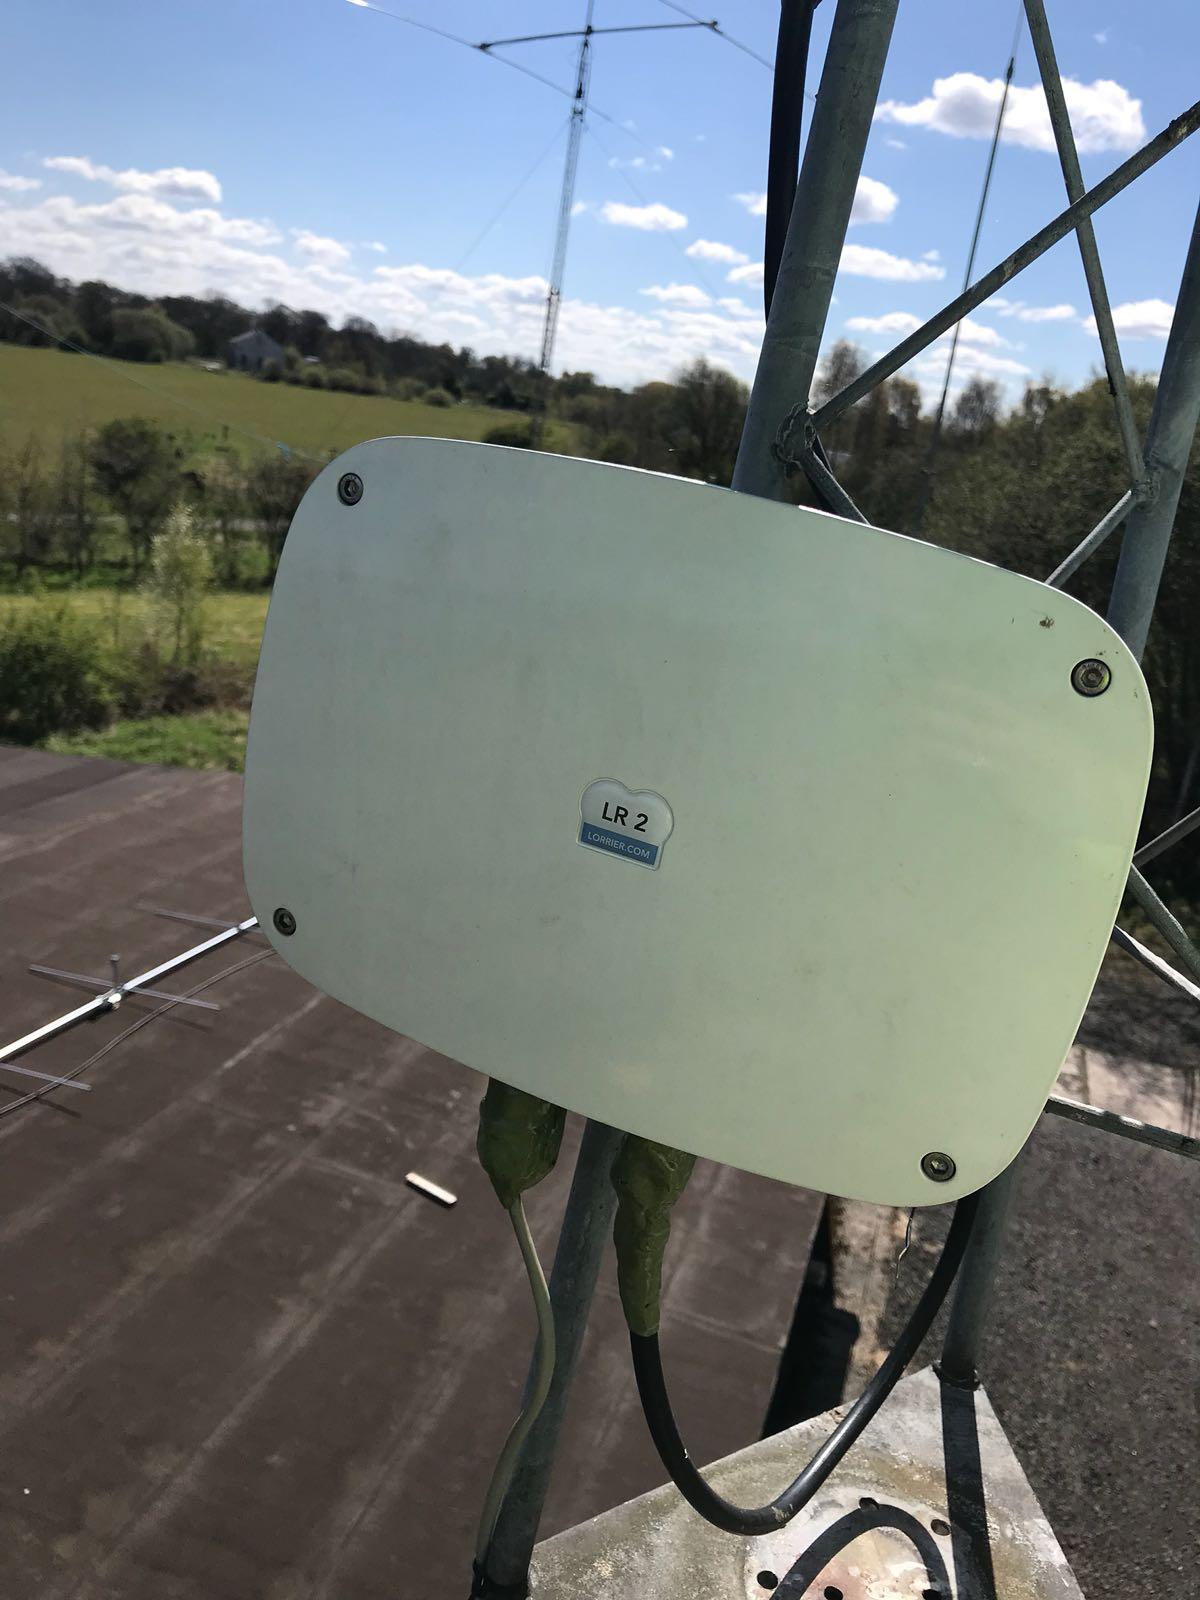 LoRaWAN IoT gateway